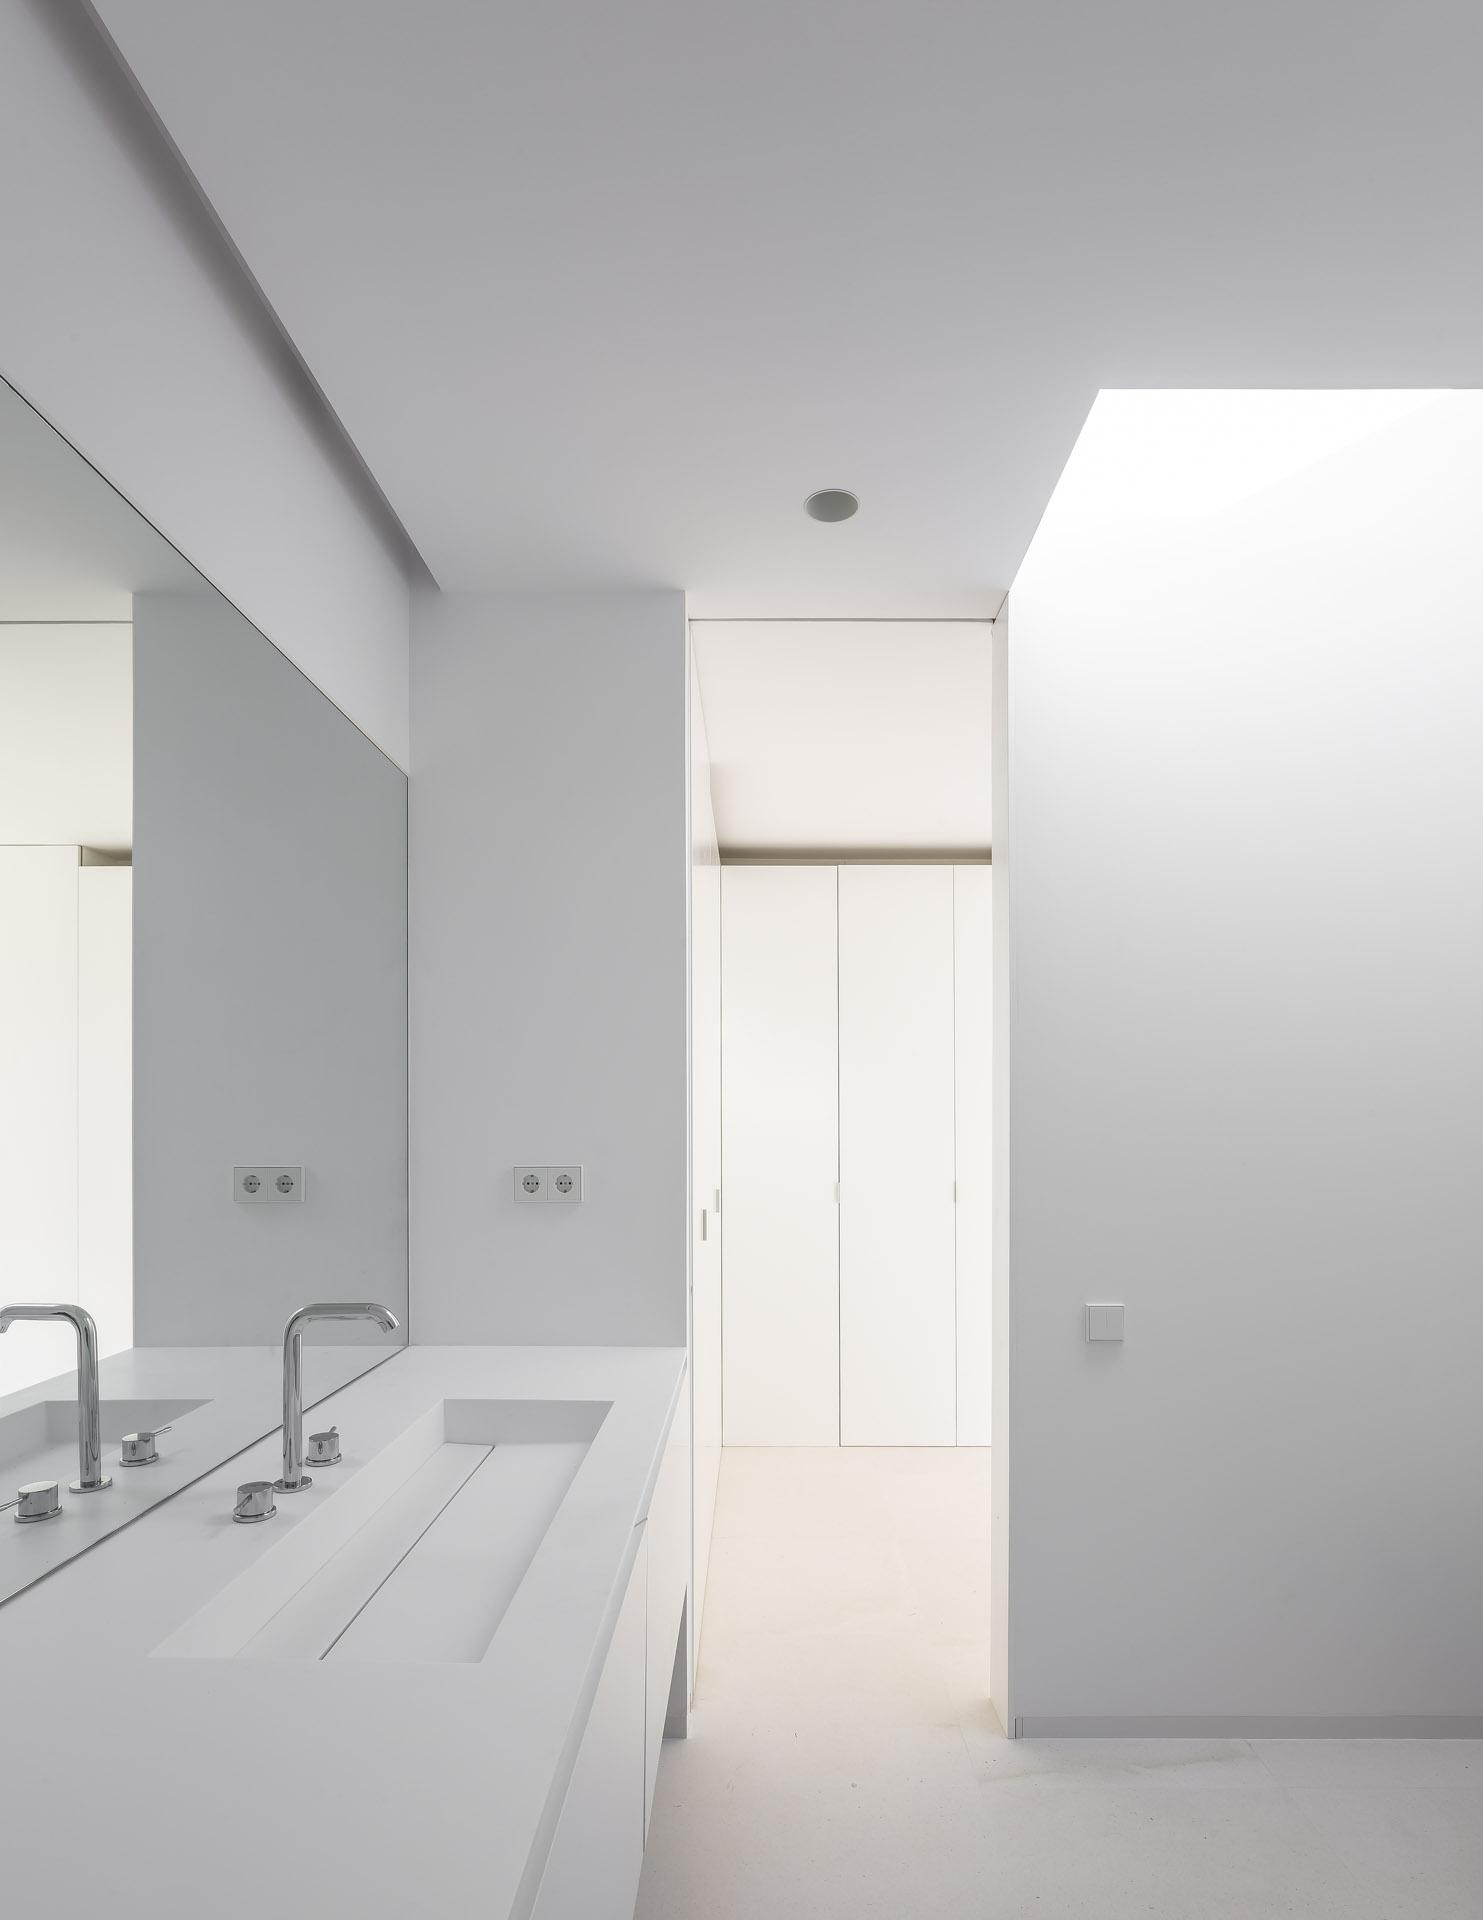 fotografia-arquitectura-valencia-german-cabo-gallardo-llopis-villamarchante-vivienda-27